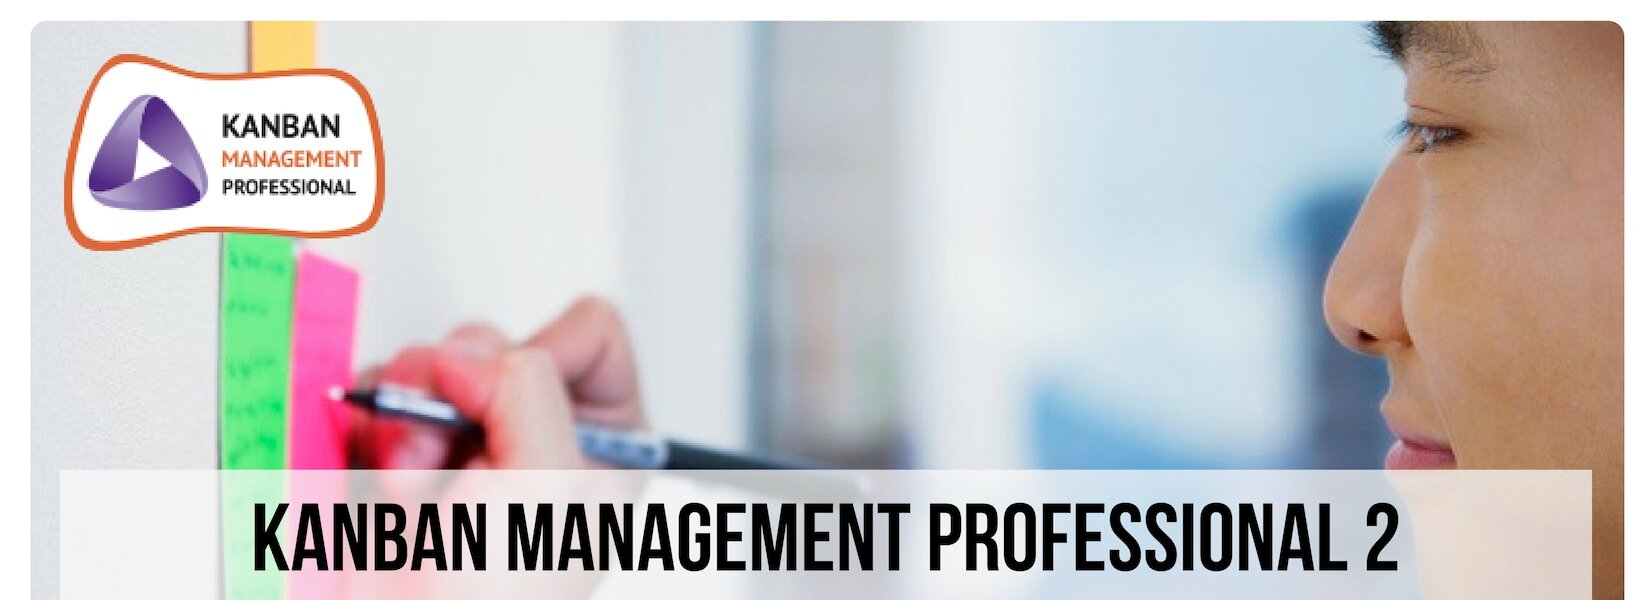 Kanban Management Professional 2.png